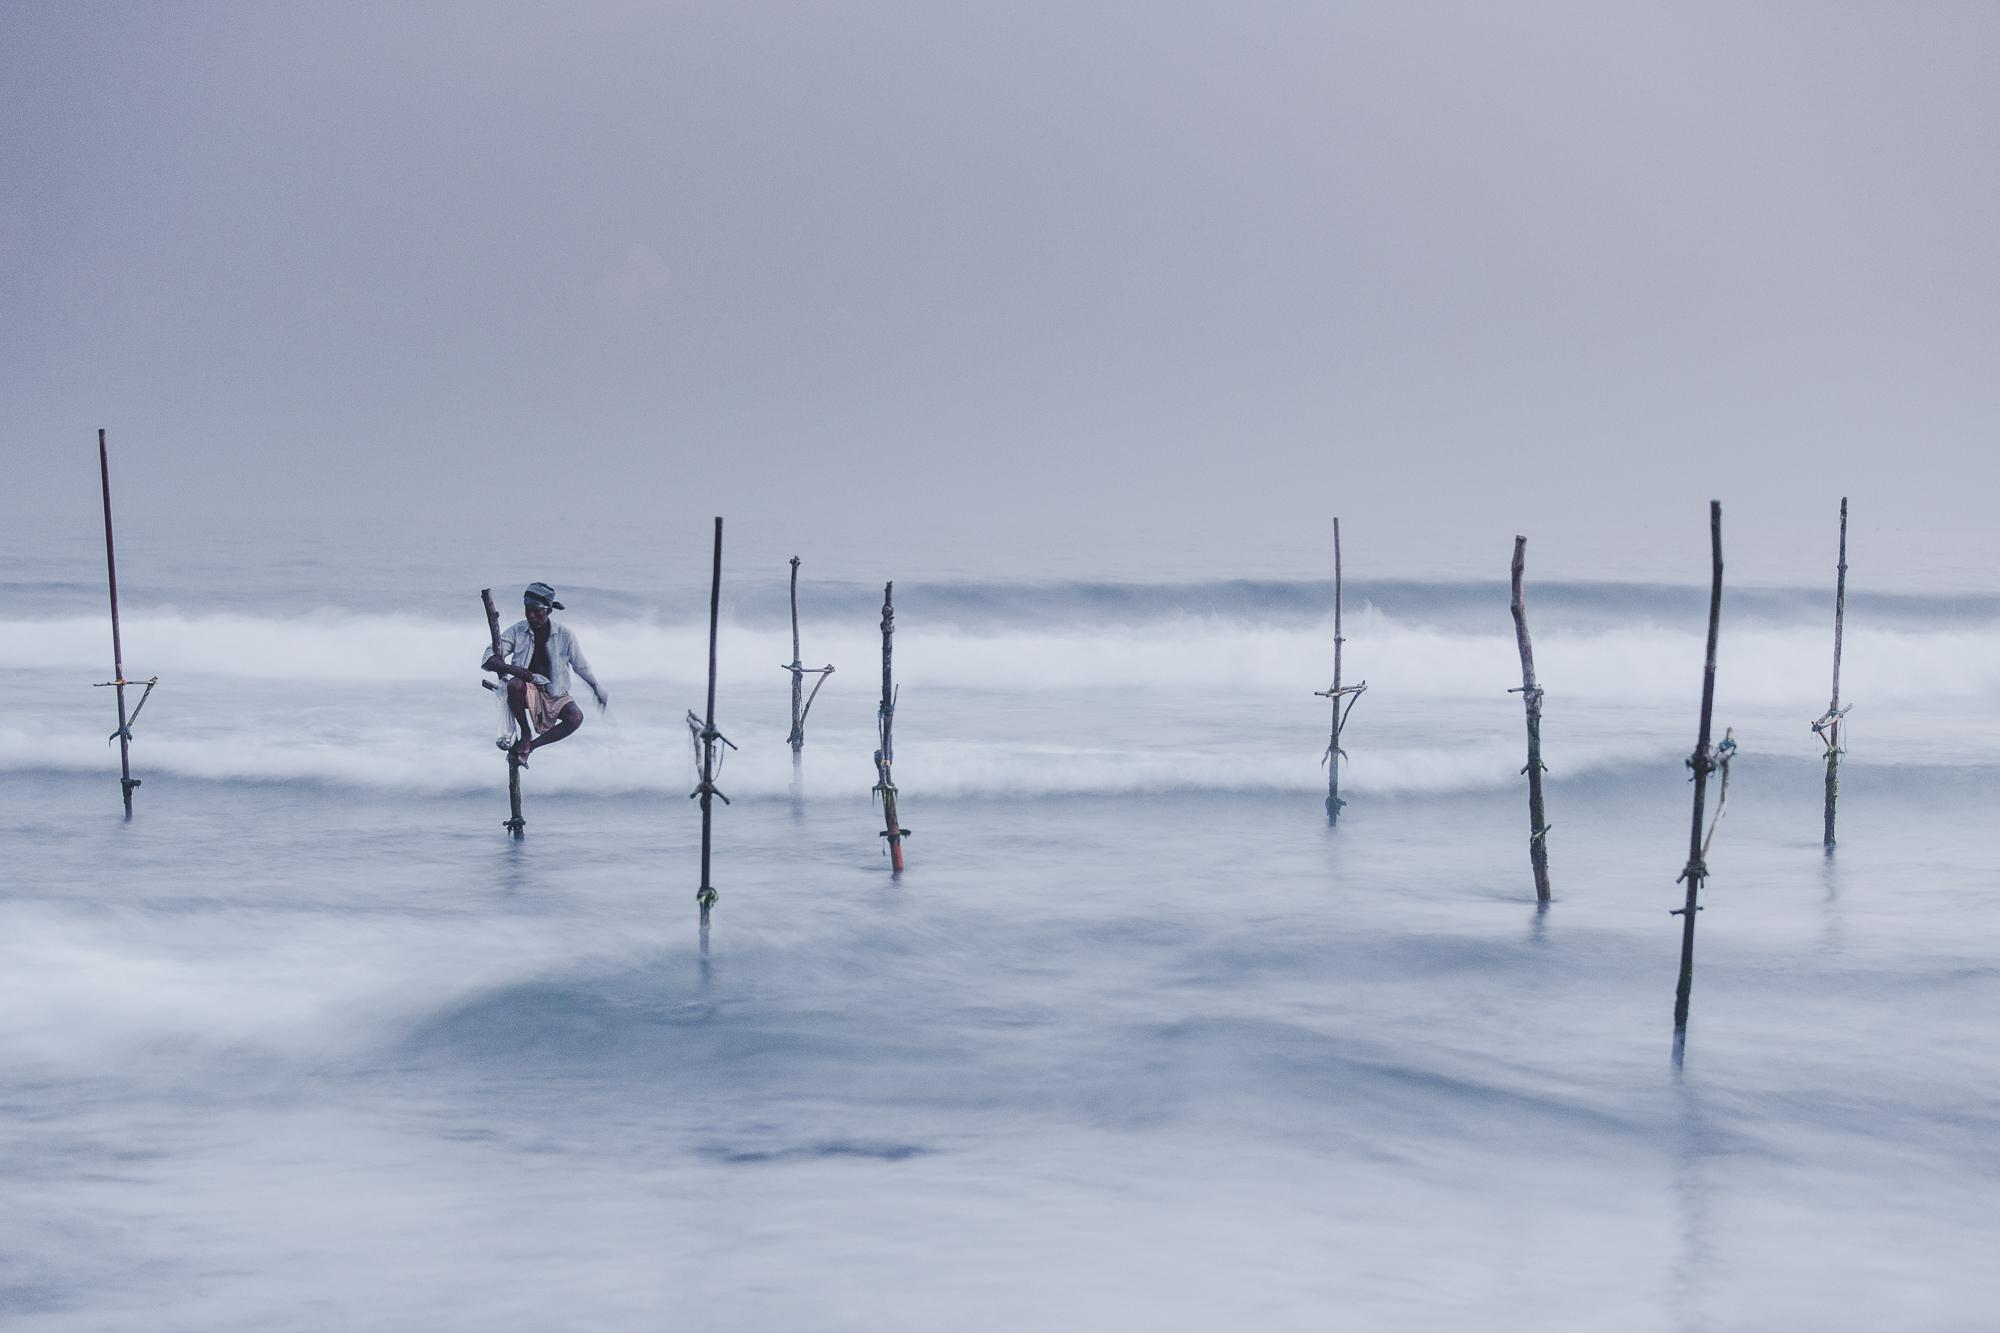 One fishermen on the stilts